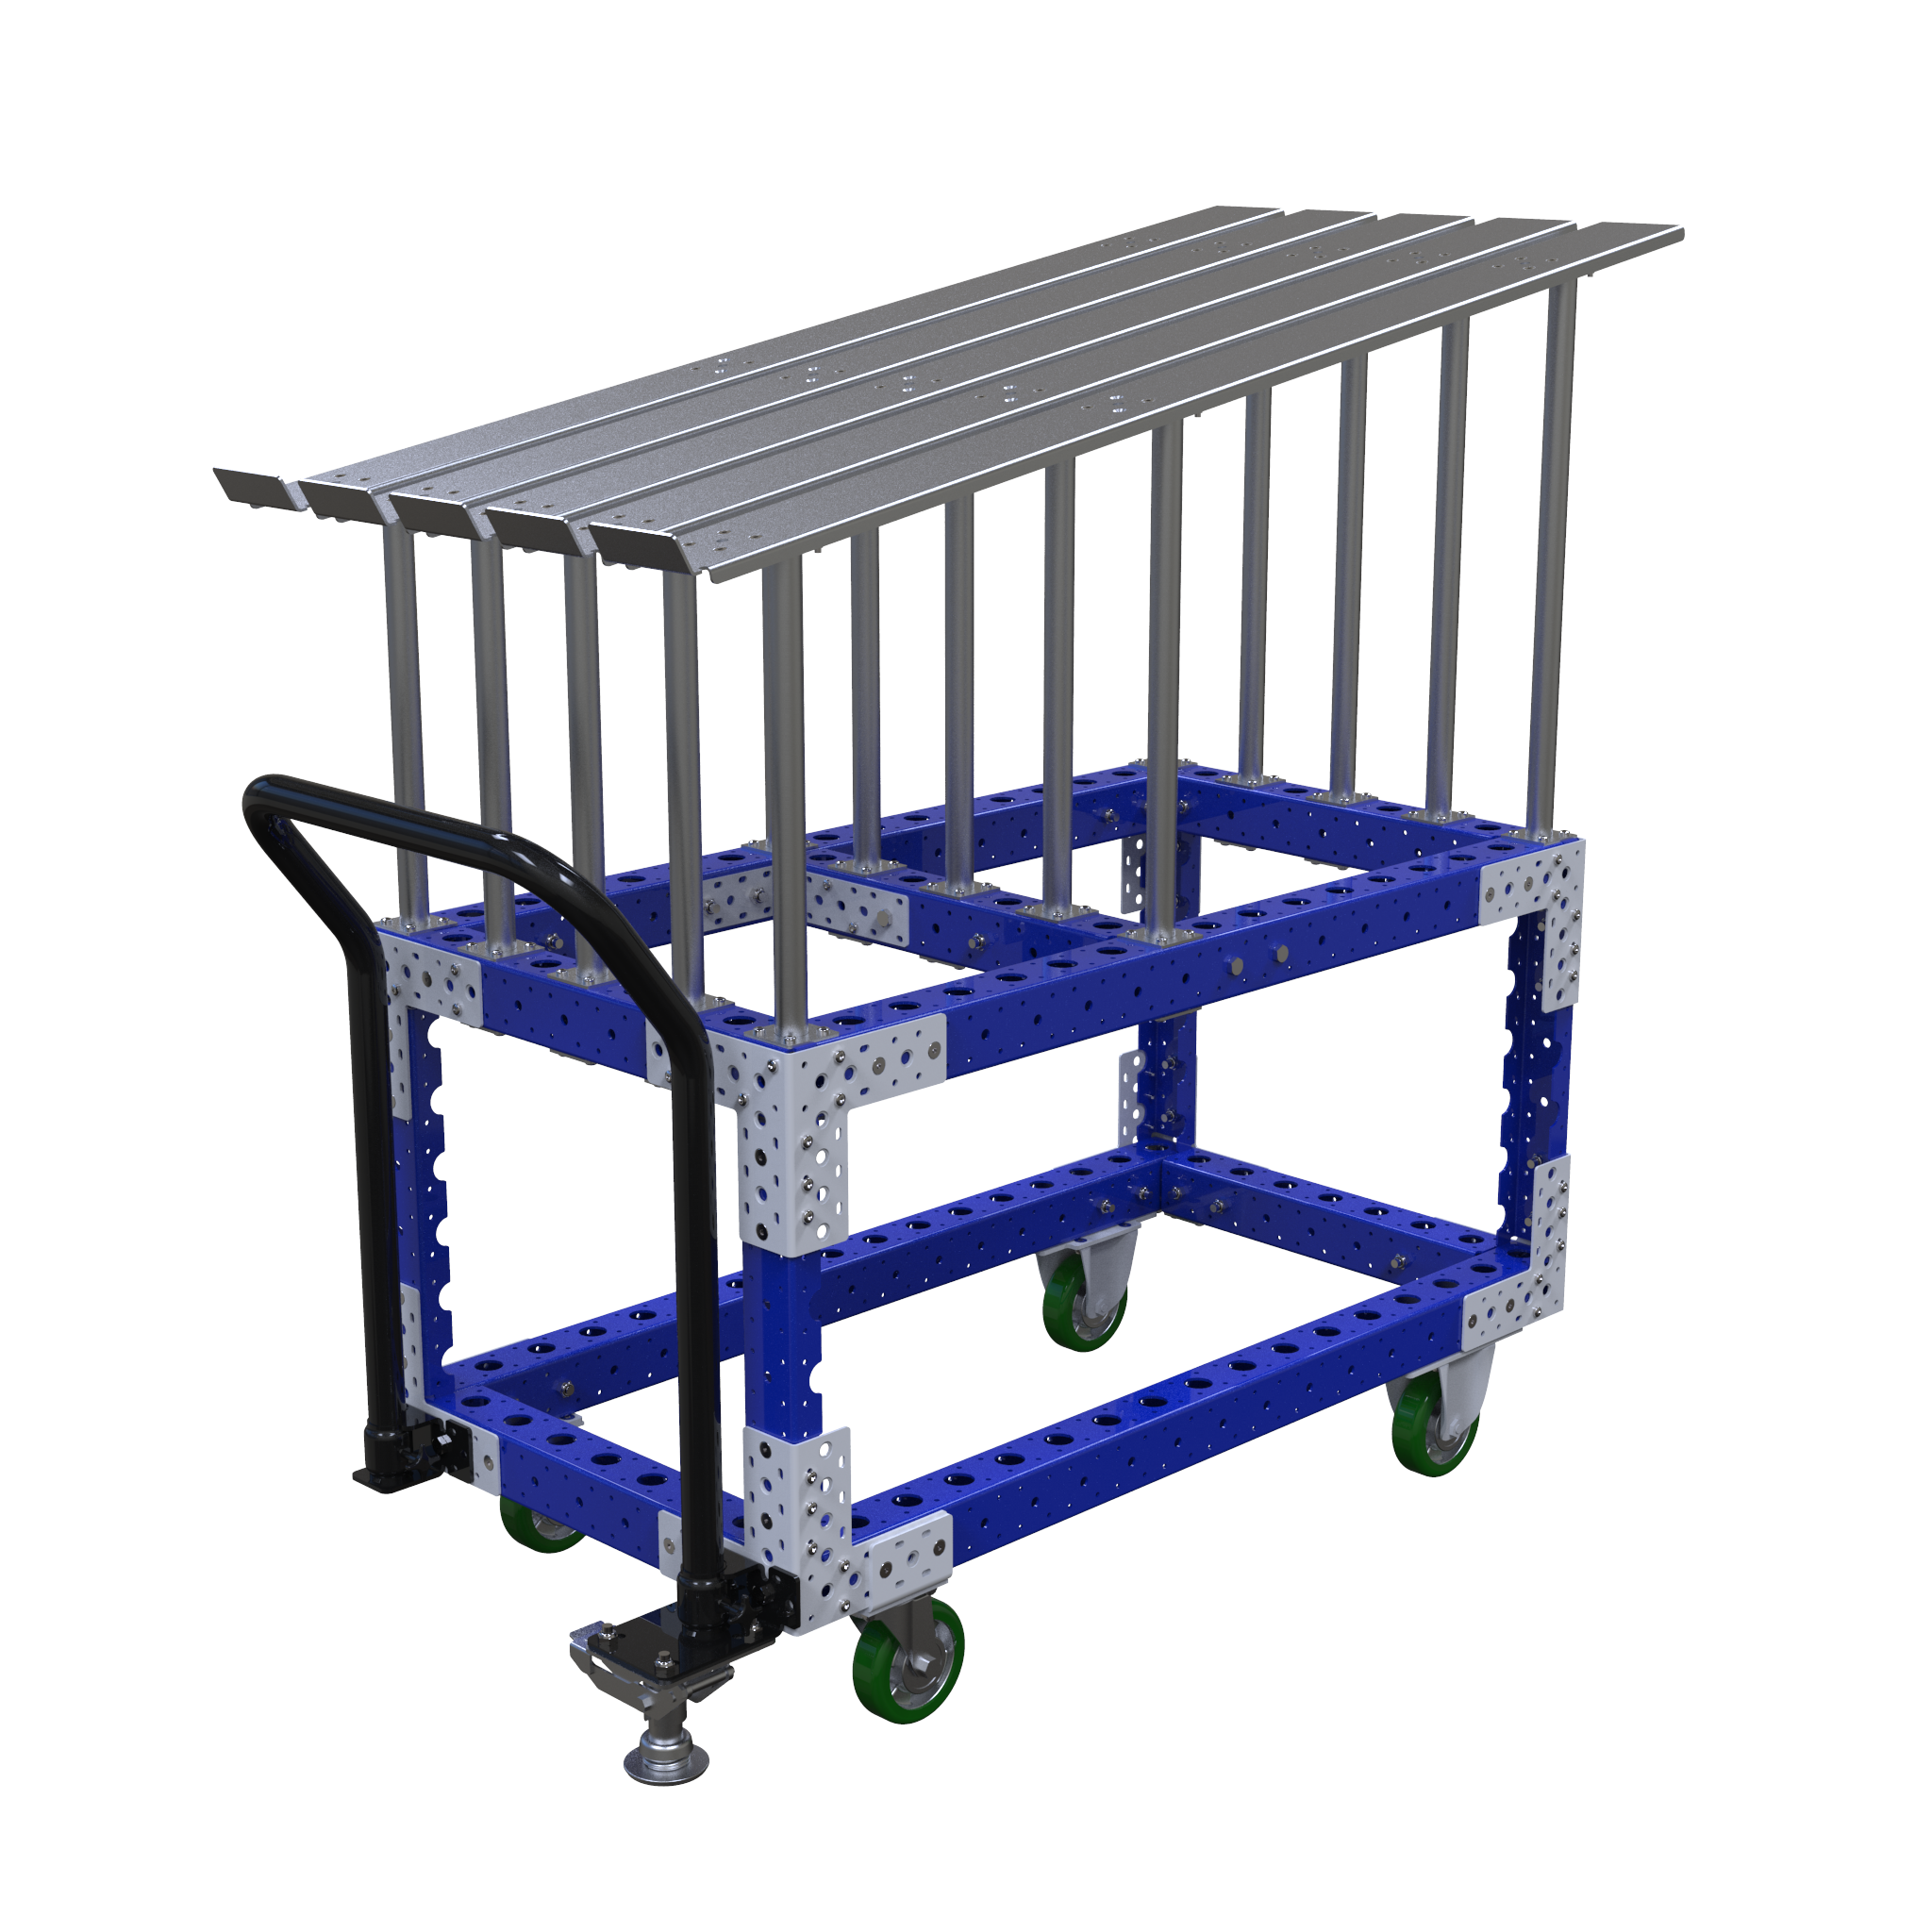 Kit Cart – 1190 x 630 mm